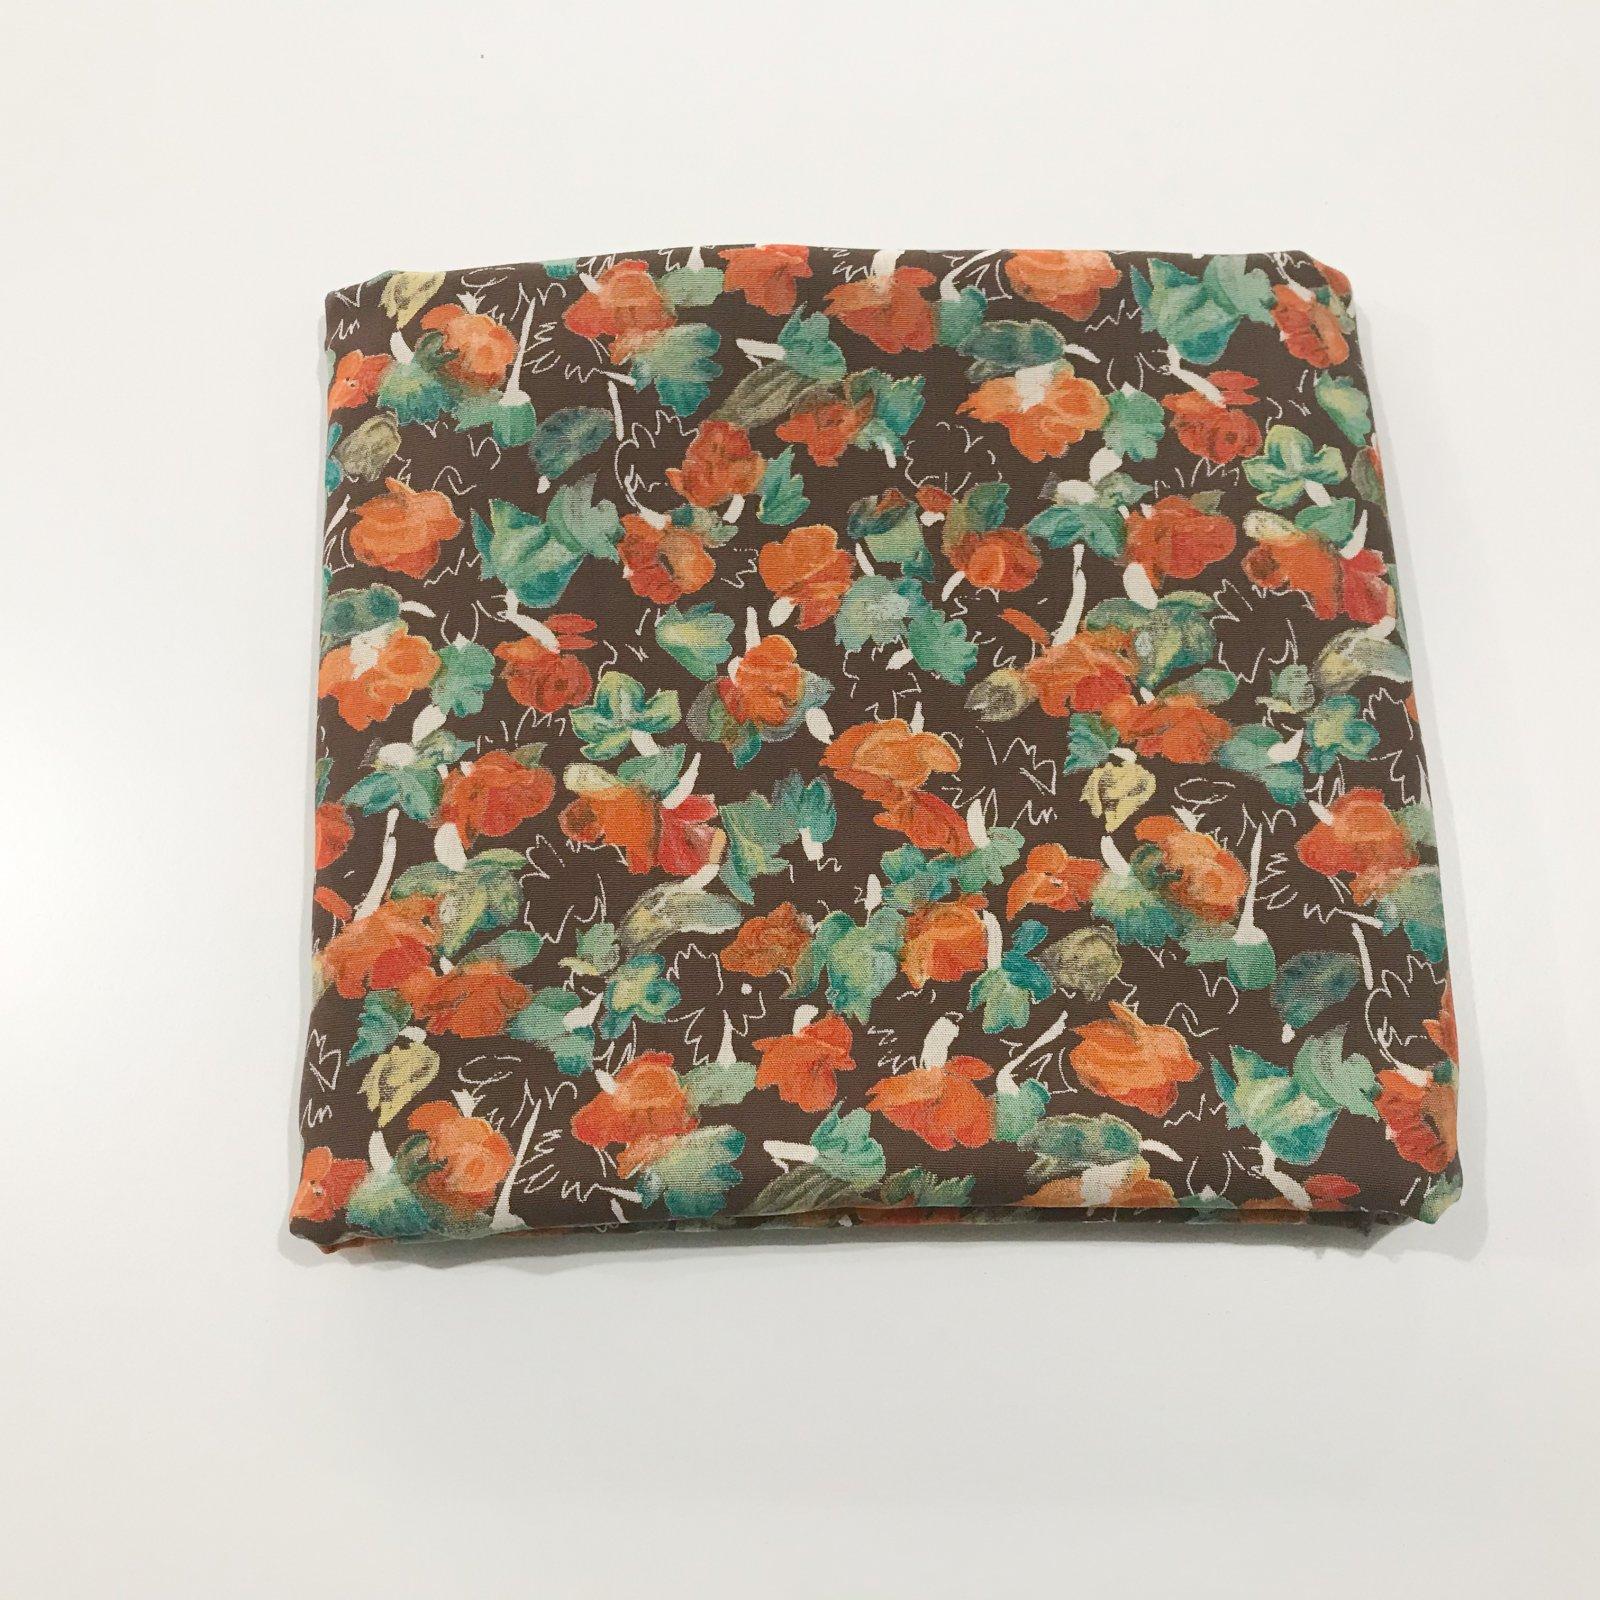 2 yards - Rayon Crepe - Mocha & Burnt Orange